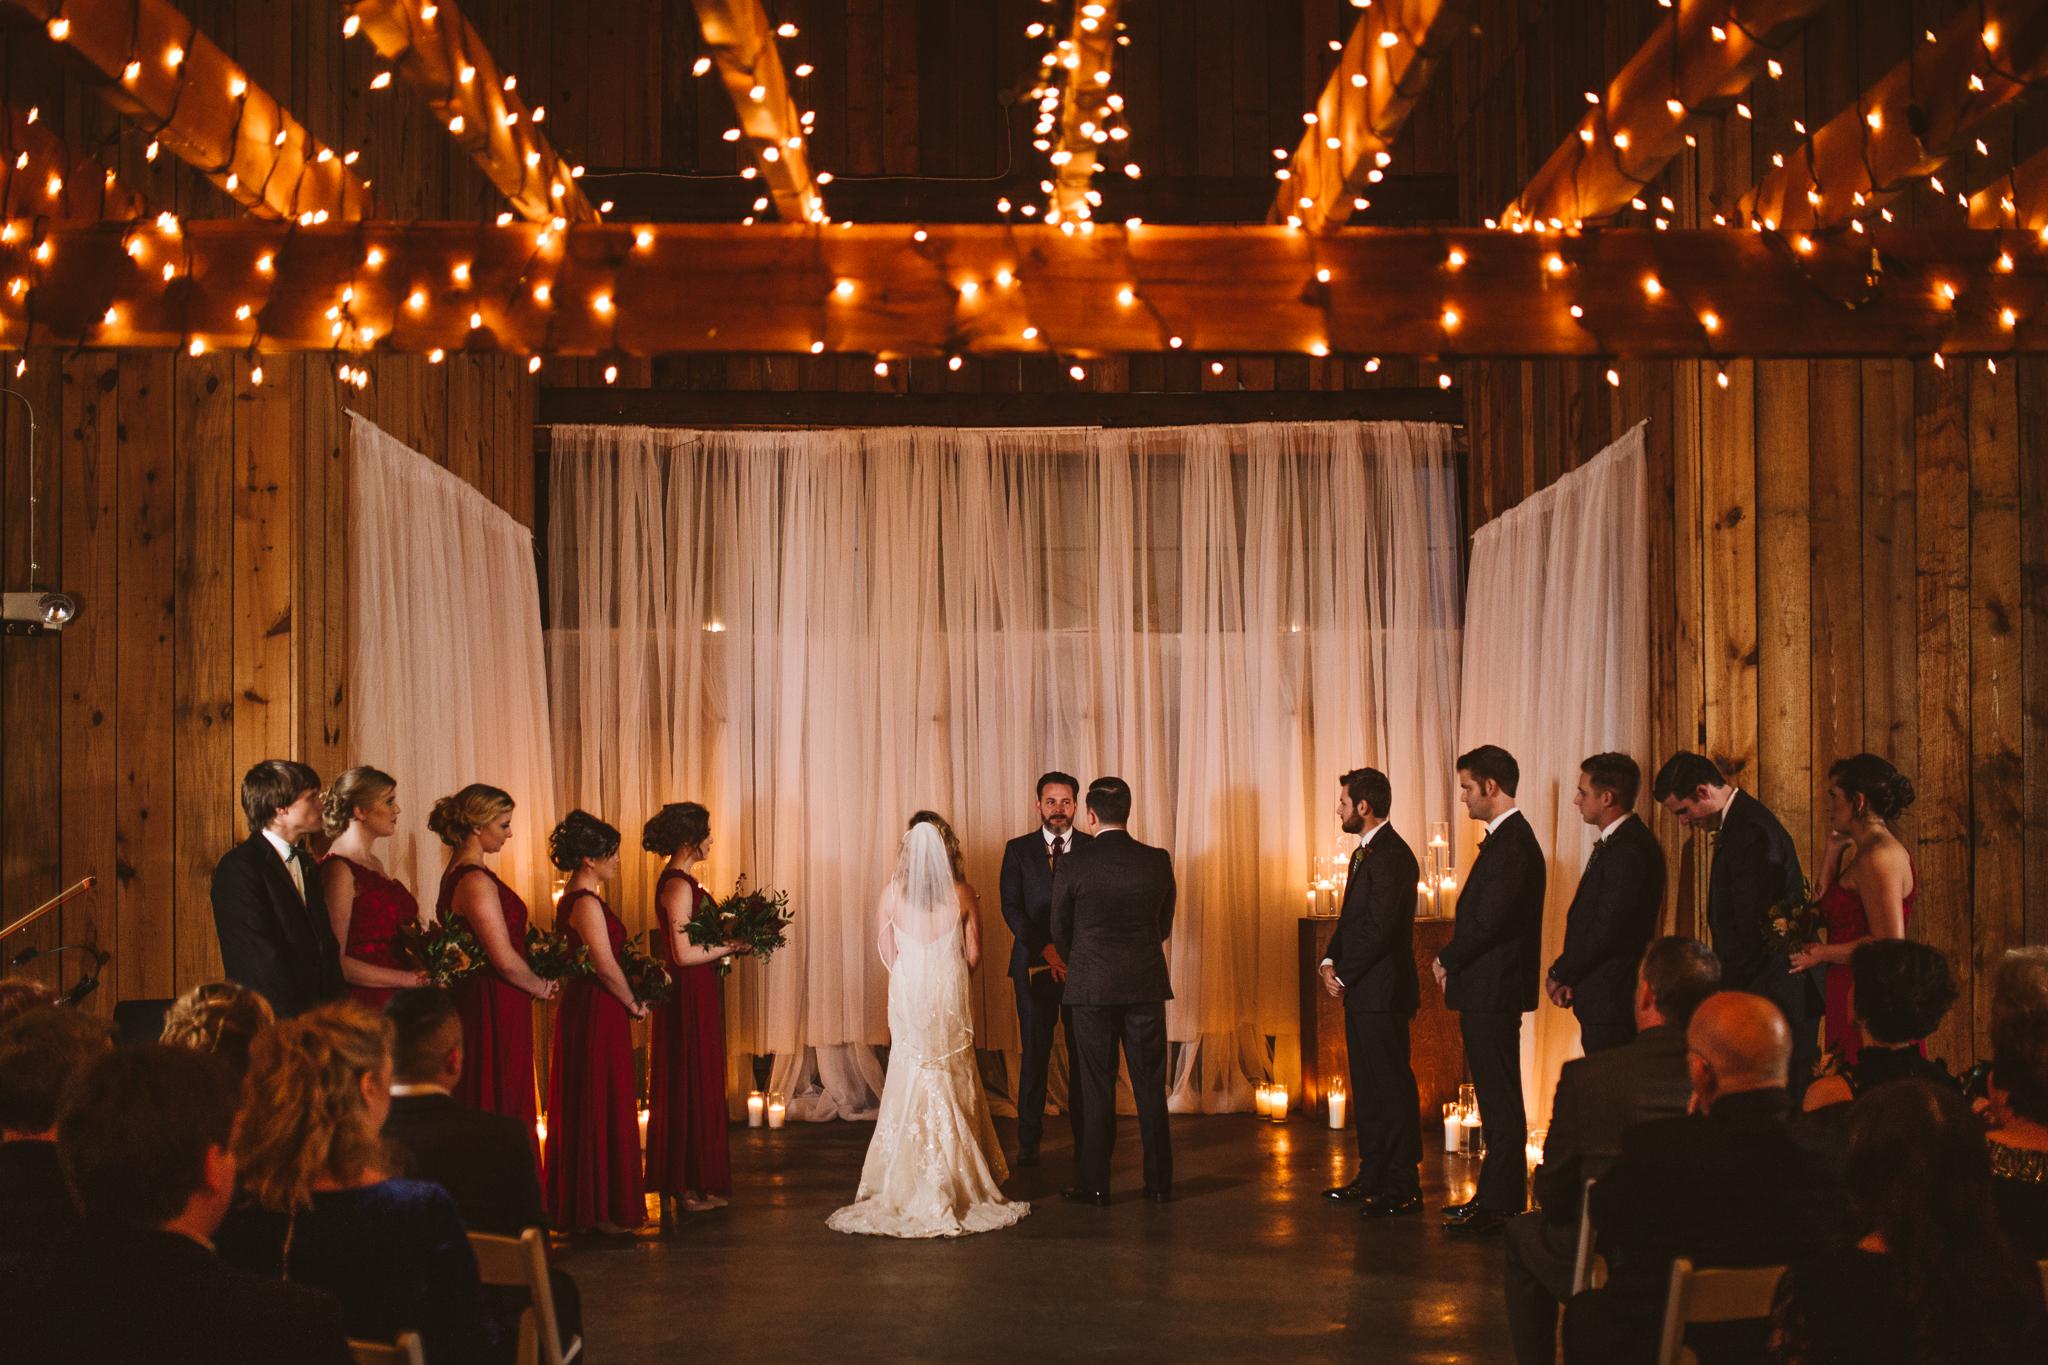 0120 Ariana Jordan Photo - Cameron & Lauren's Wedding at Talon Winery  7017.jpg